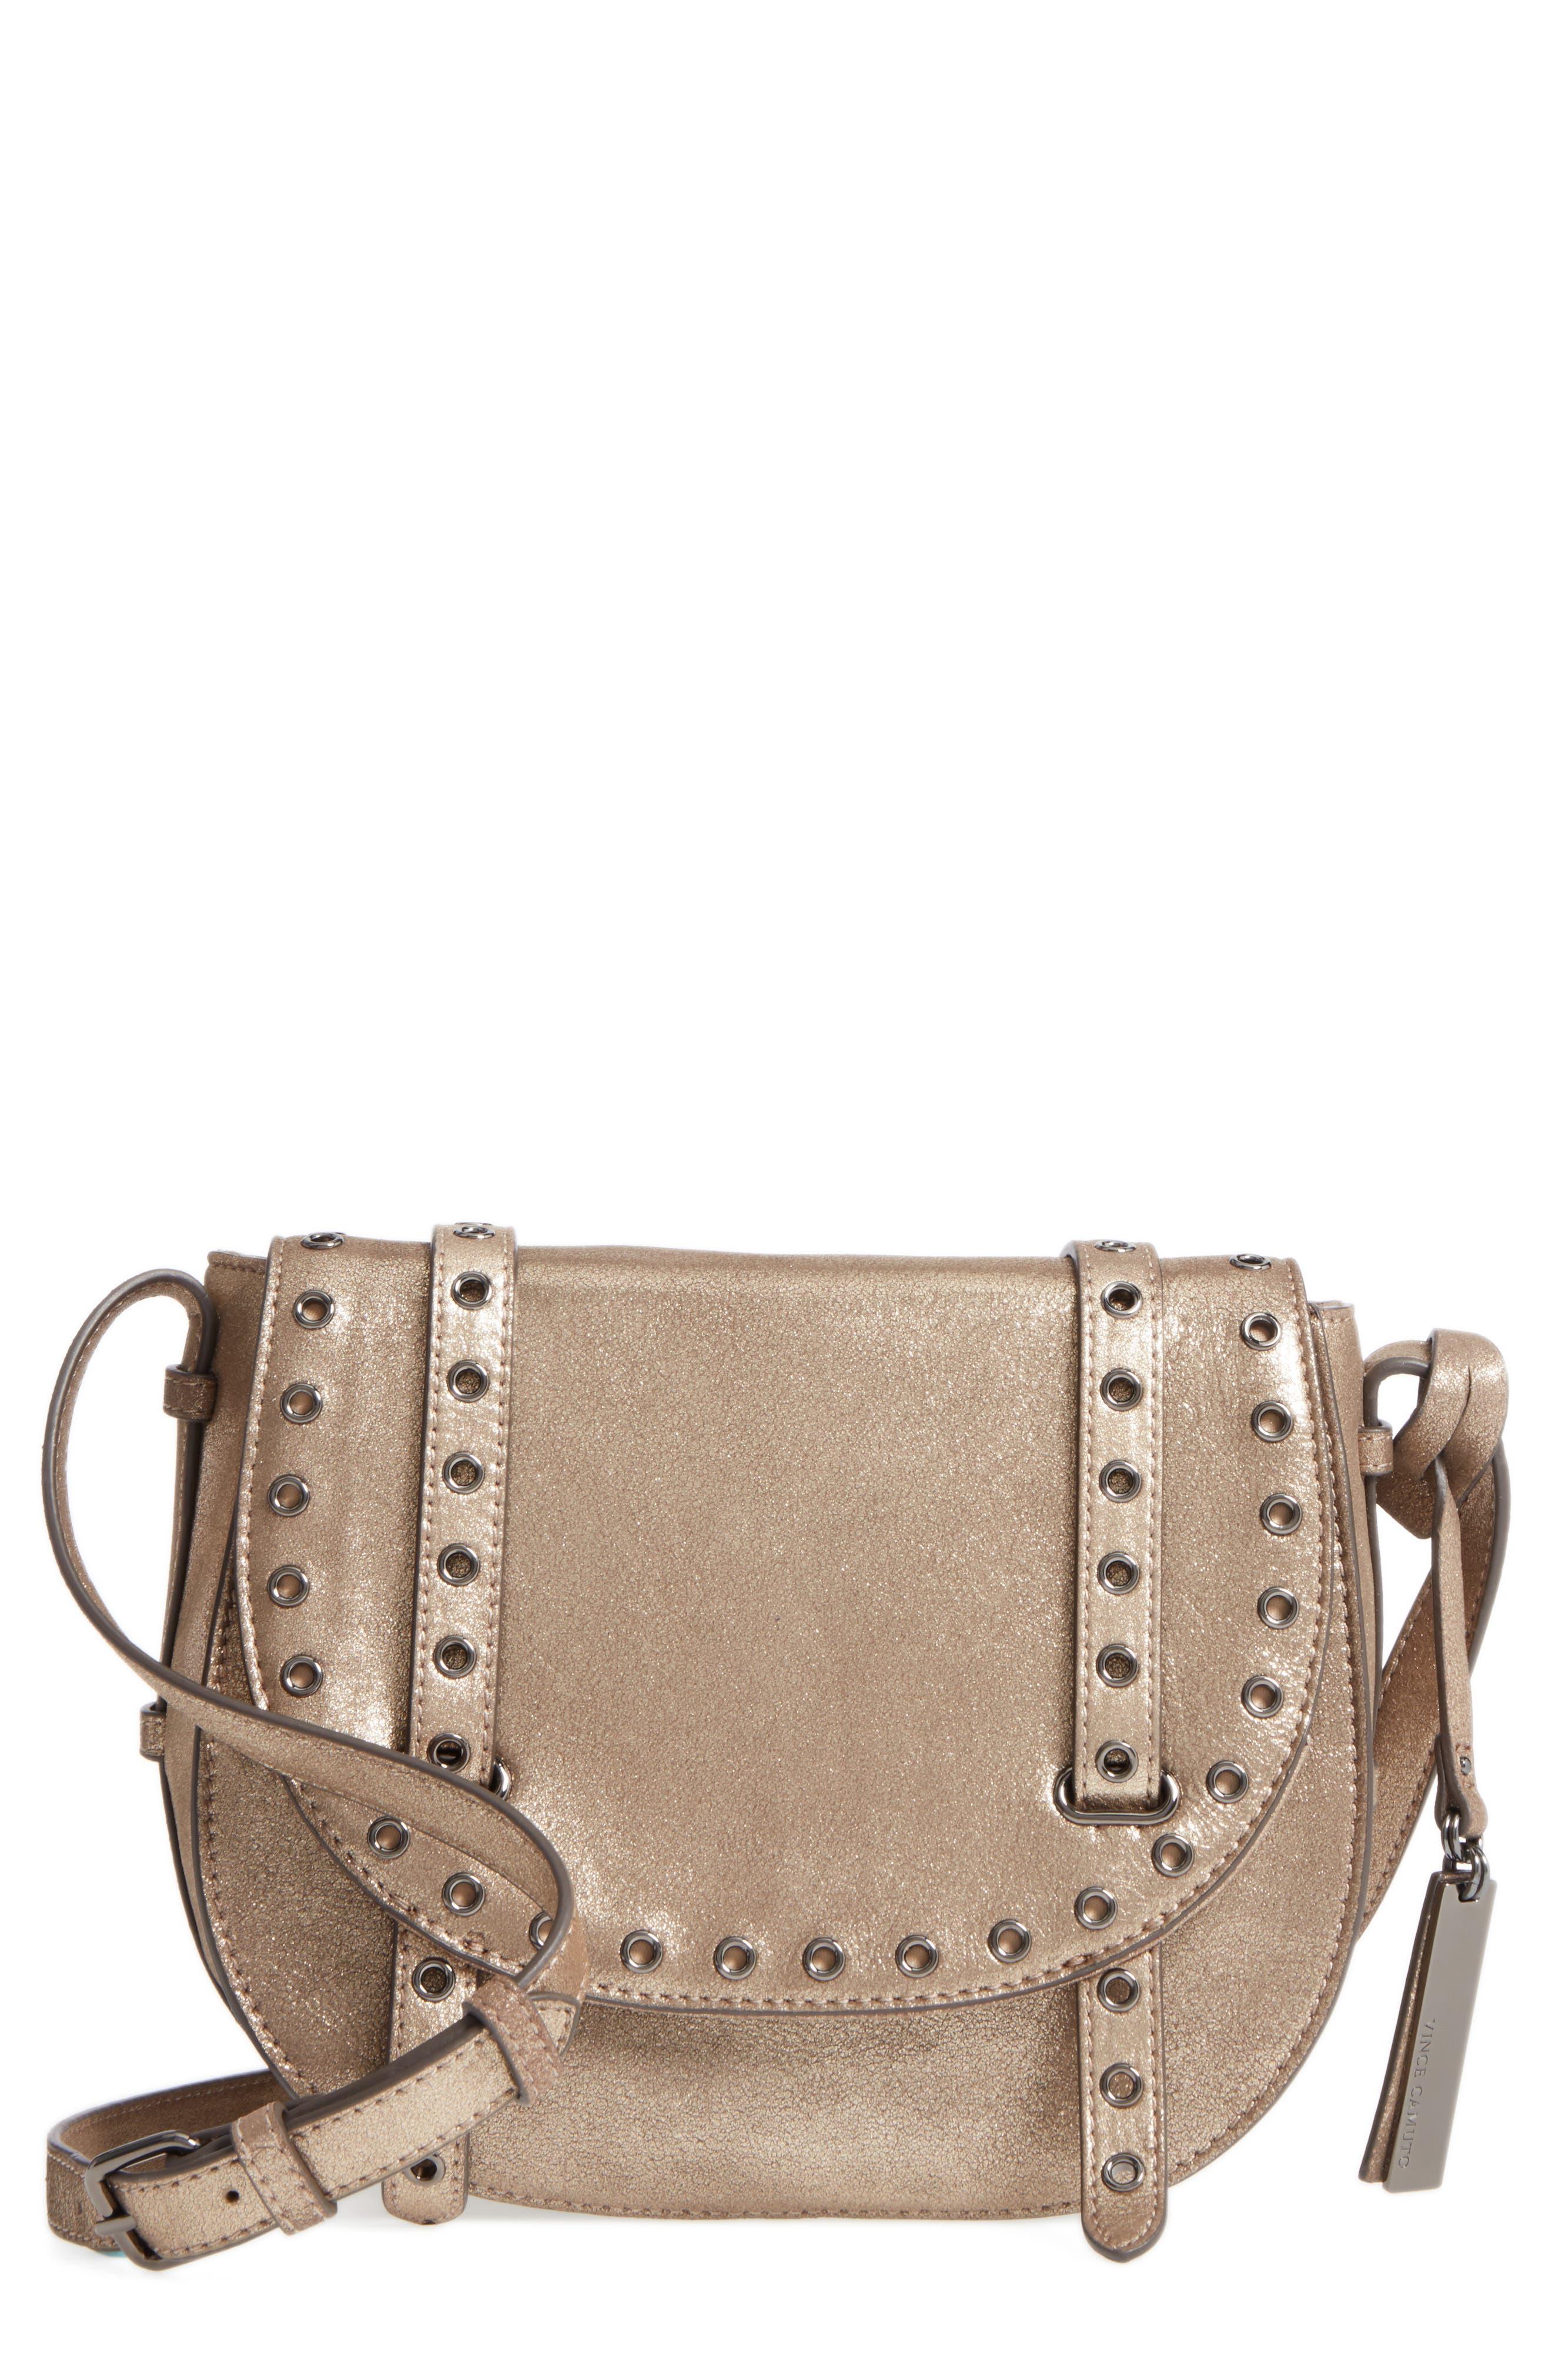 Vince Camuto Areli Suede & Leather Crossbody Saddle Bag